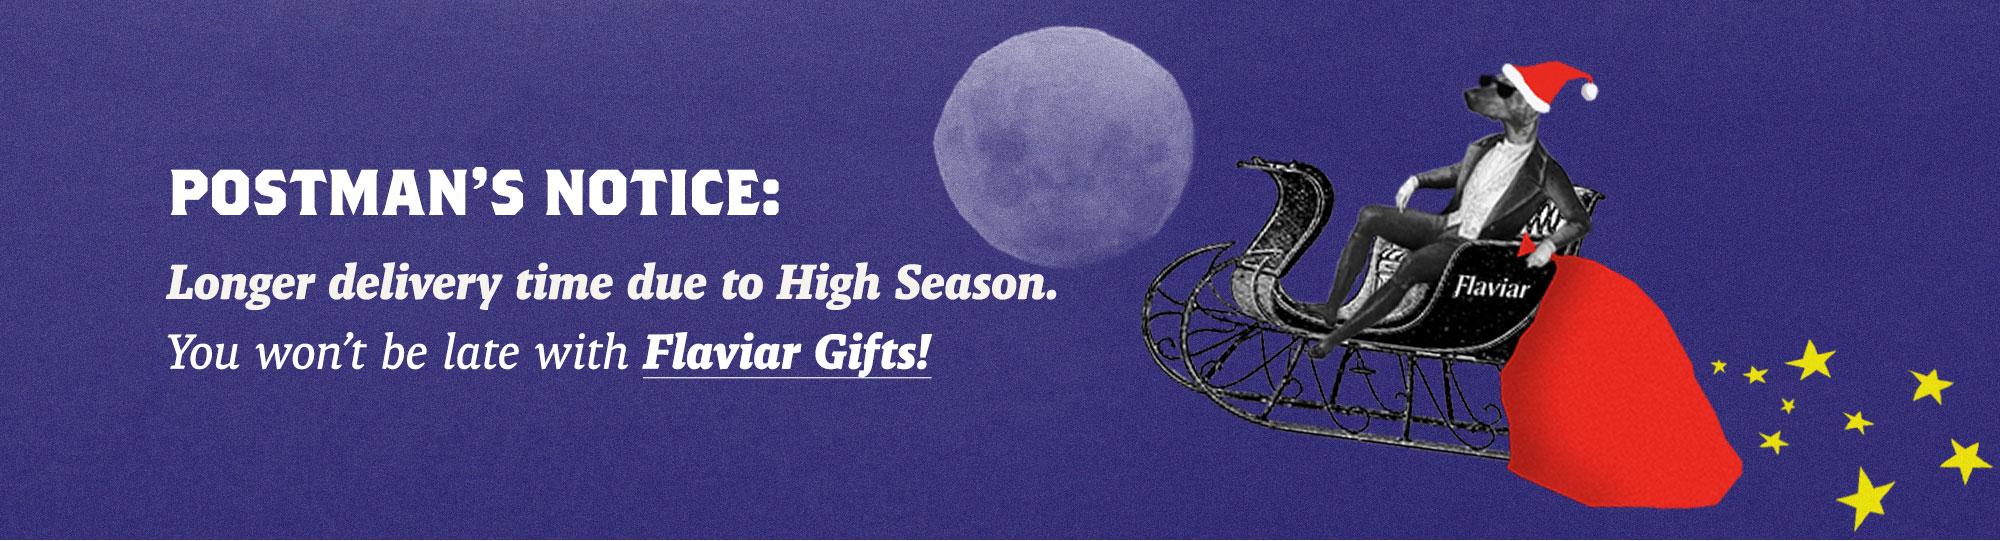 Flaviar Gifts